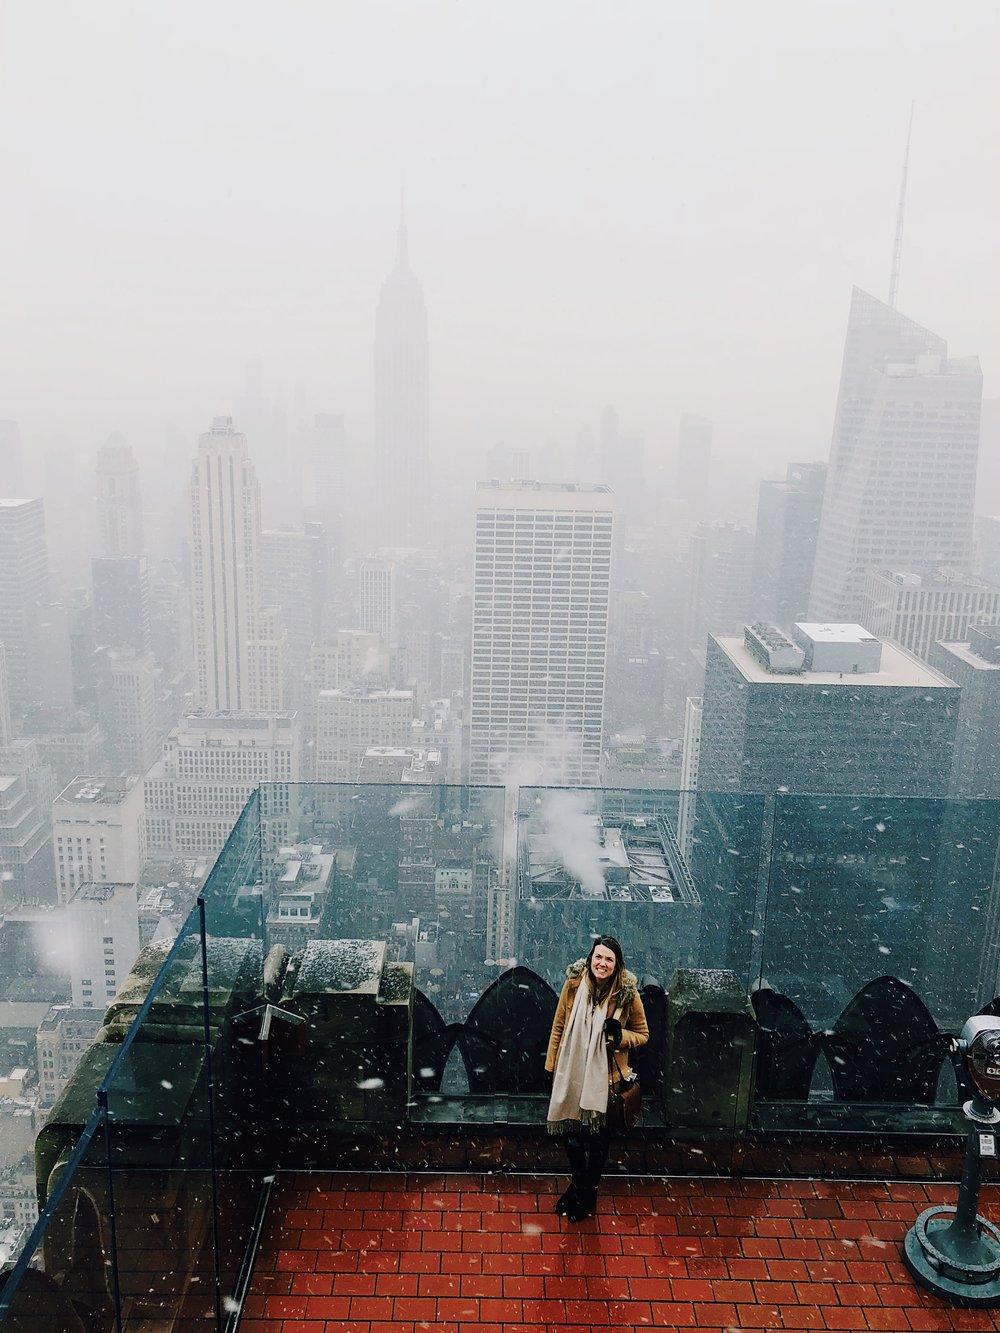 Top of the Rock, Rockefeller Center, New York City